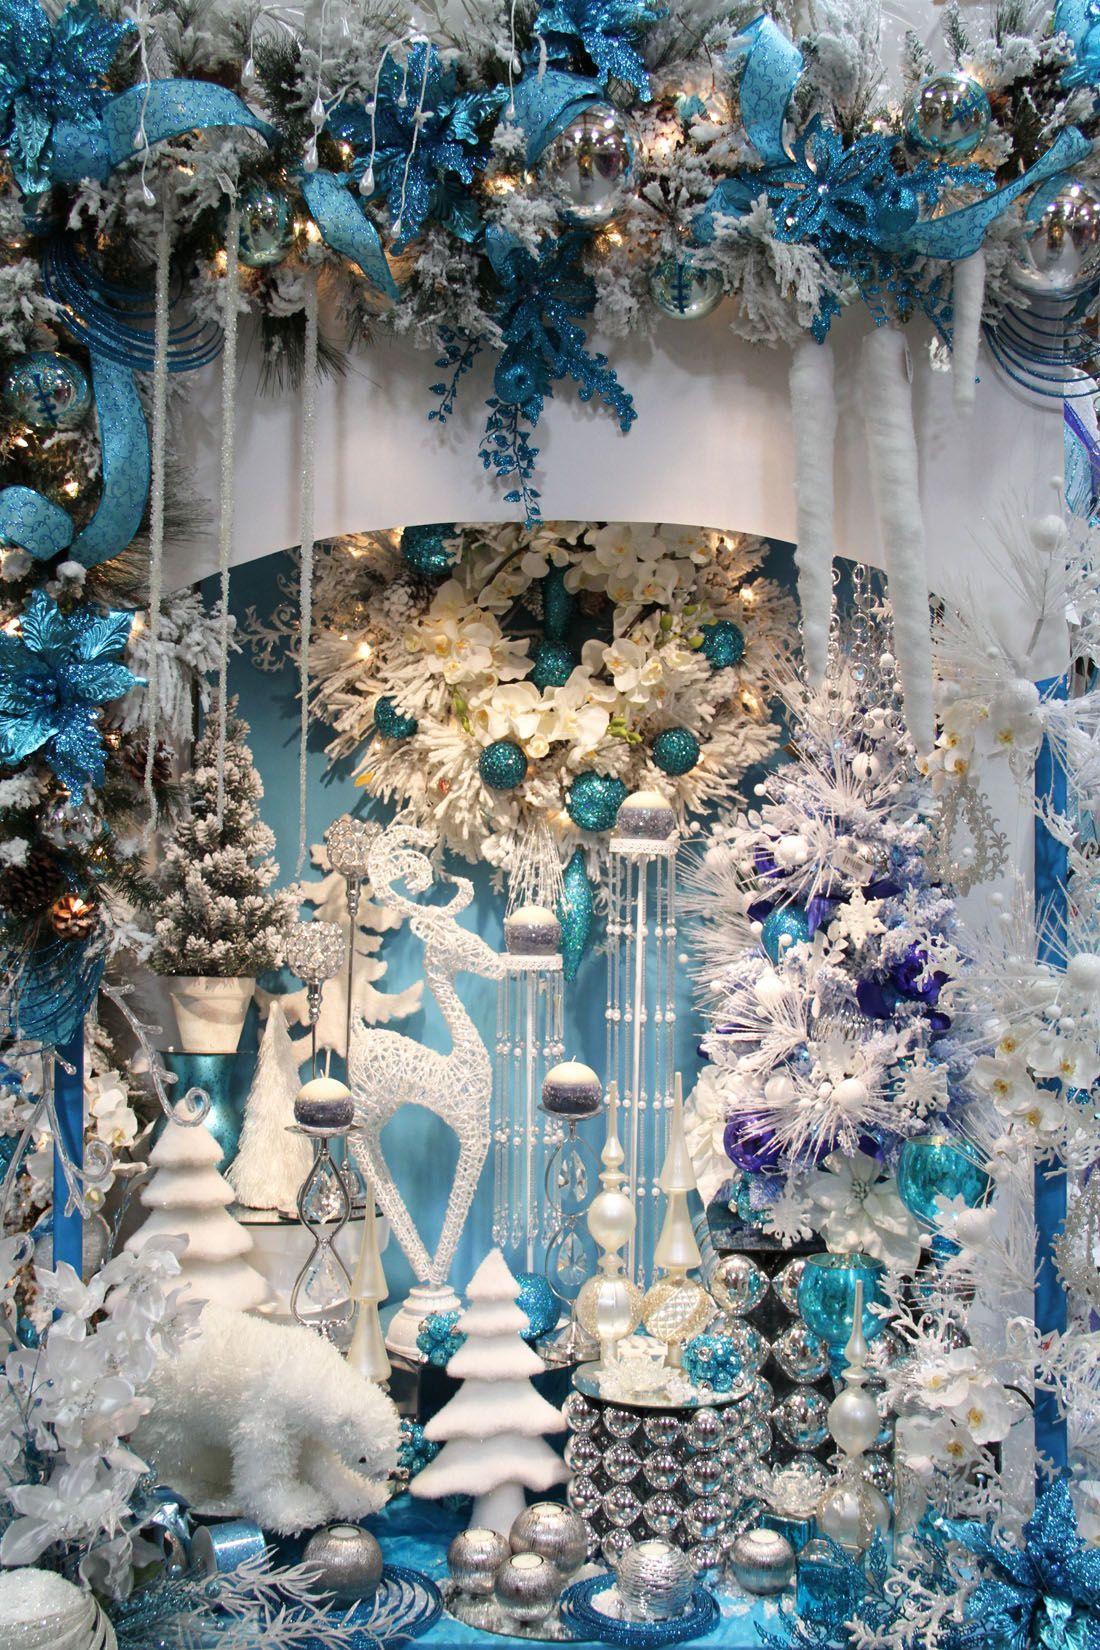 winter wonderland display 2013 the decorator 39 s super christmas warehouse santa ana ca san